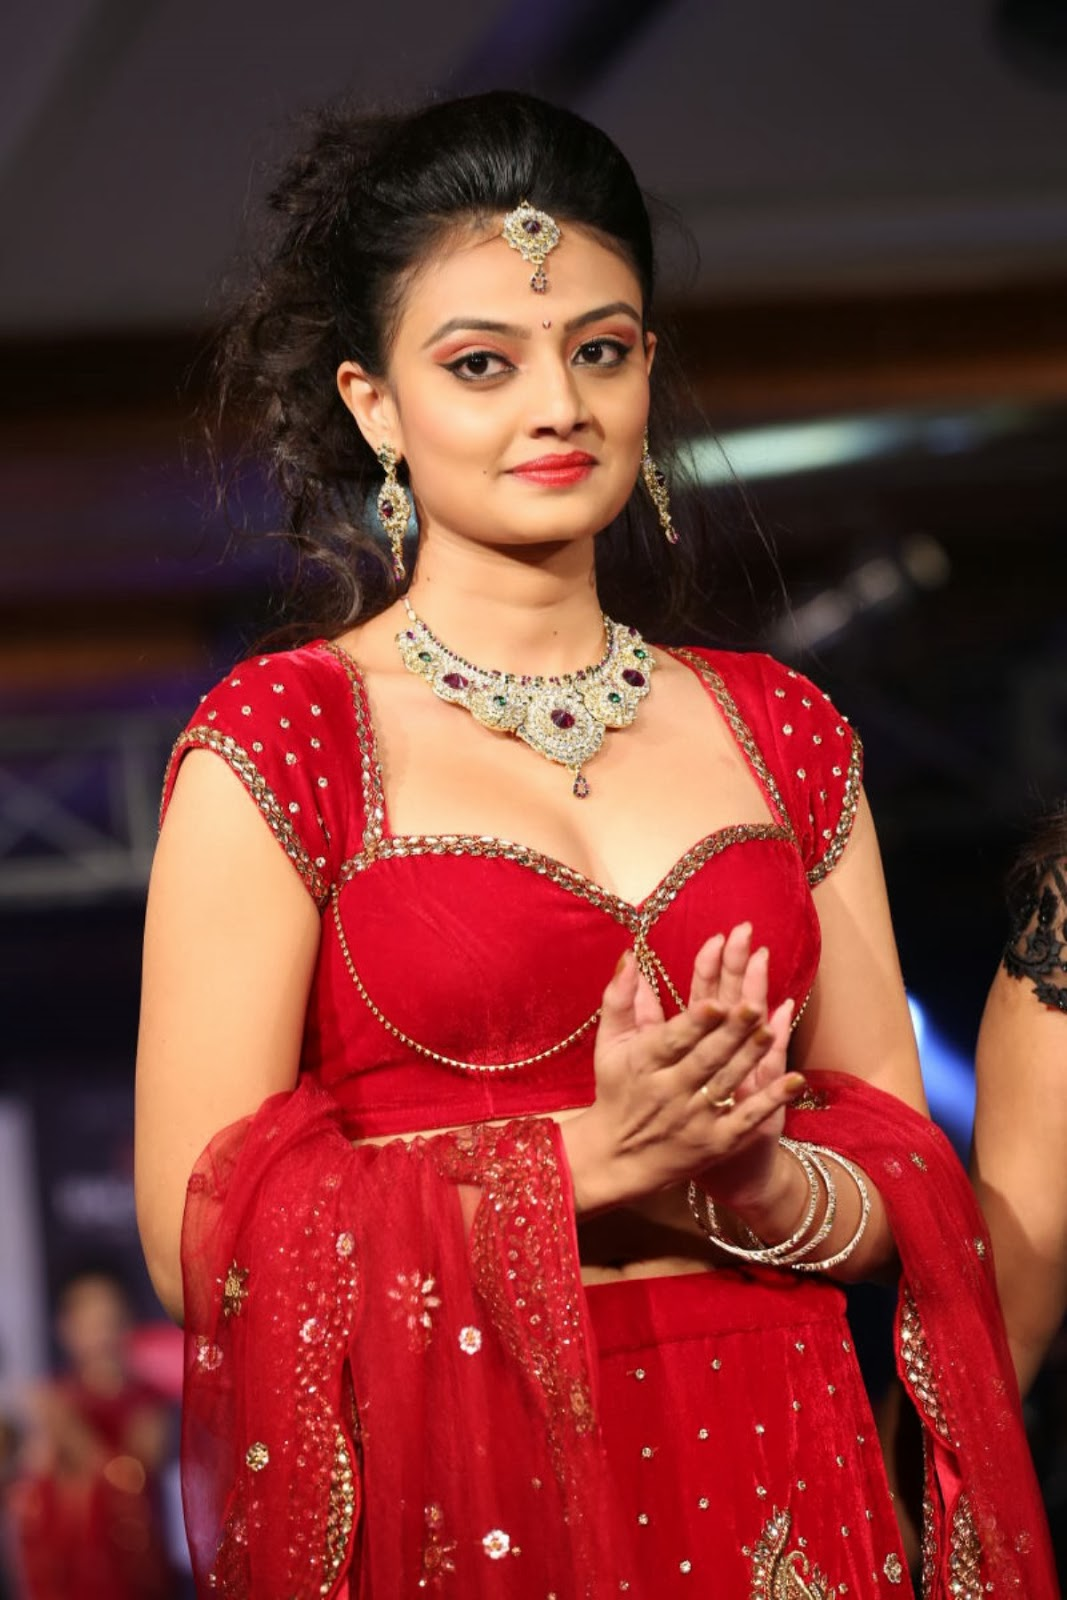 Glamorous Nikitha narayan in ethnic Indian red lengha choli dress